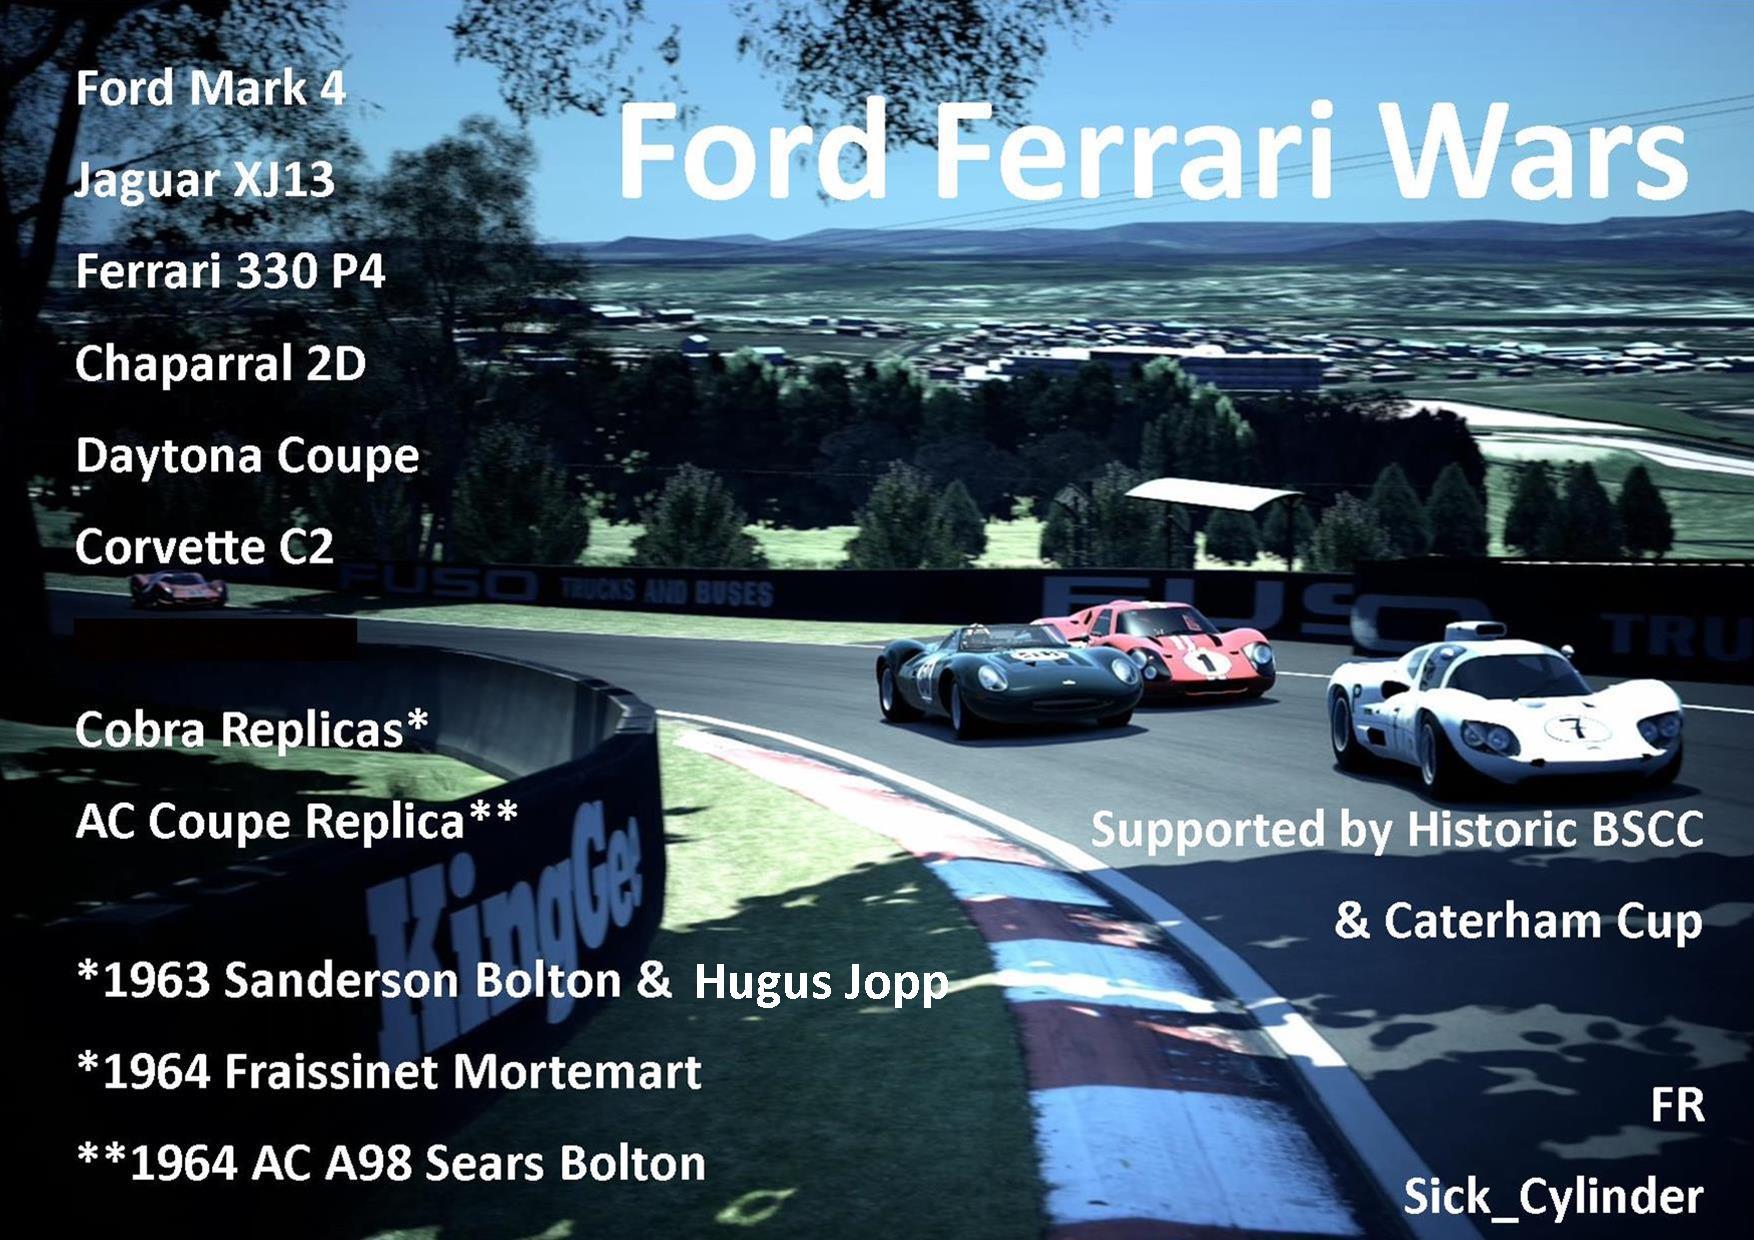 Ford Ferrari Wars Total Poster New.jpg